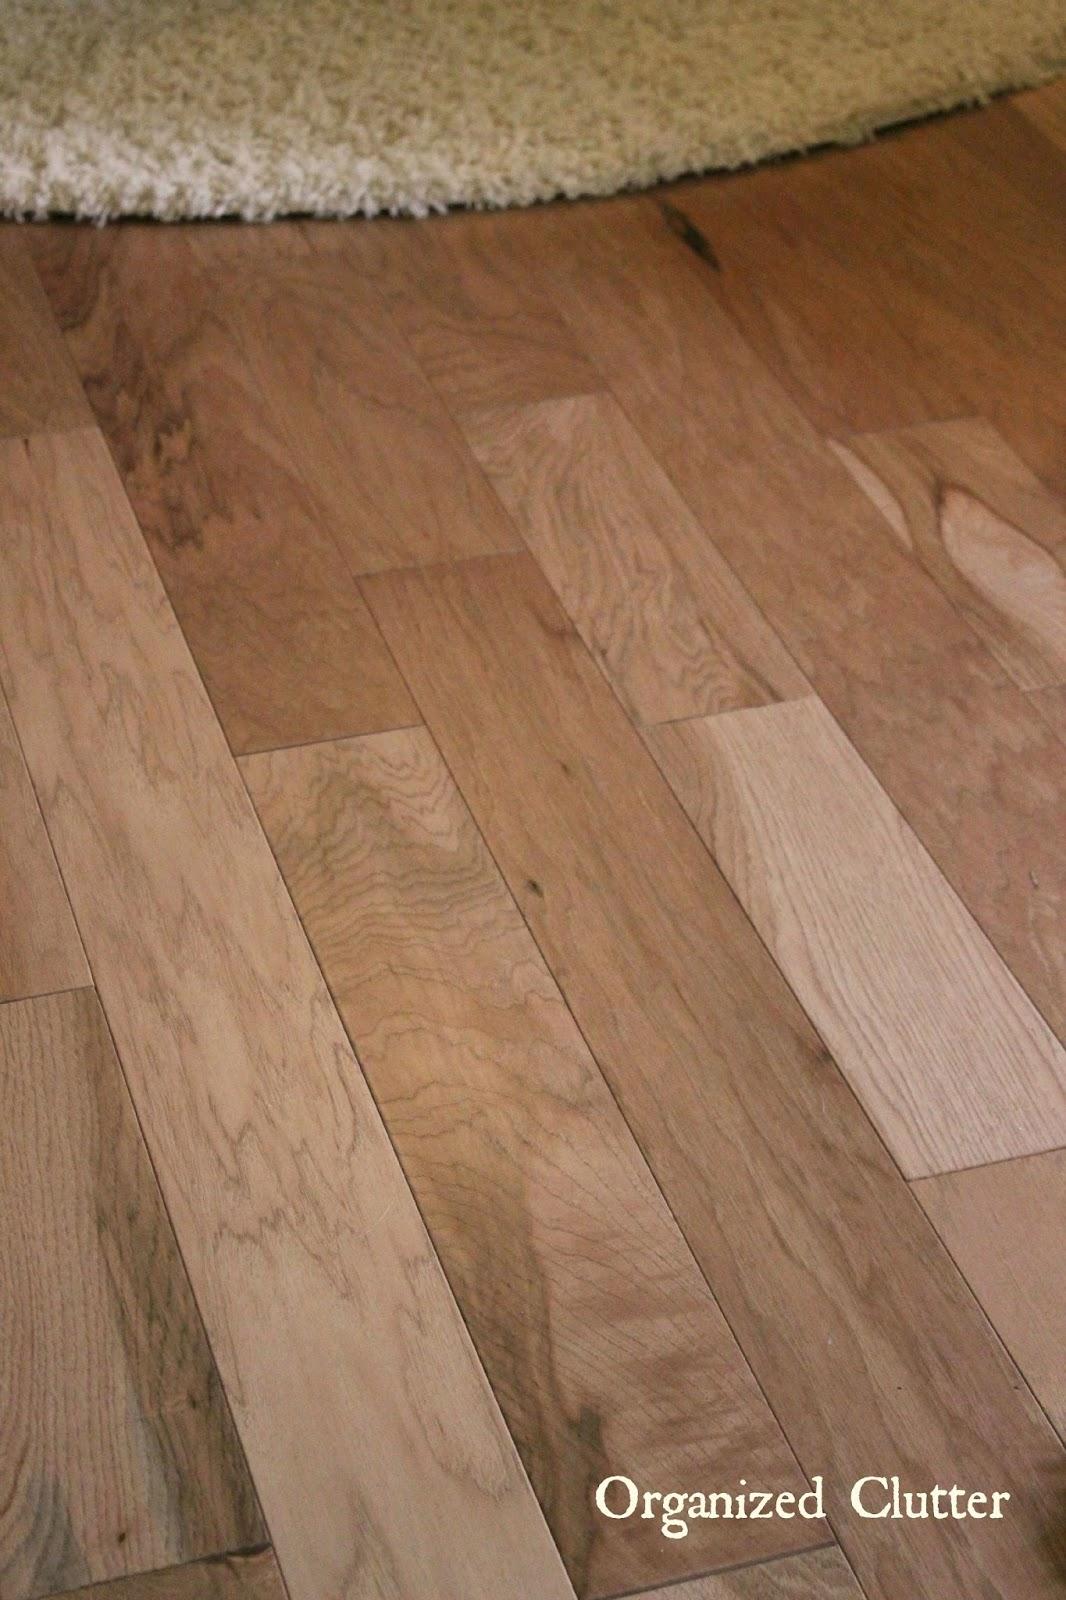 Organized Clutter Why I Chose Shaw Engineered Hardwood Flooring